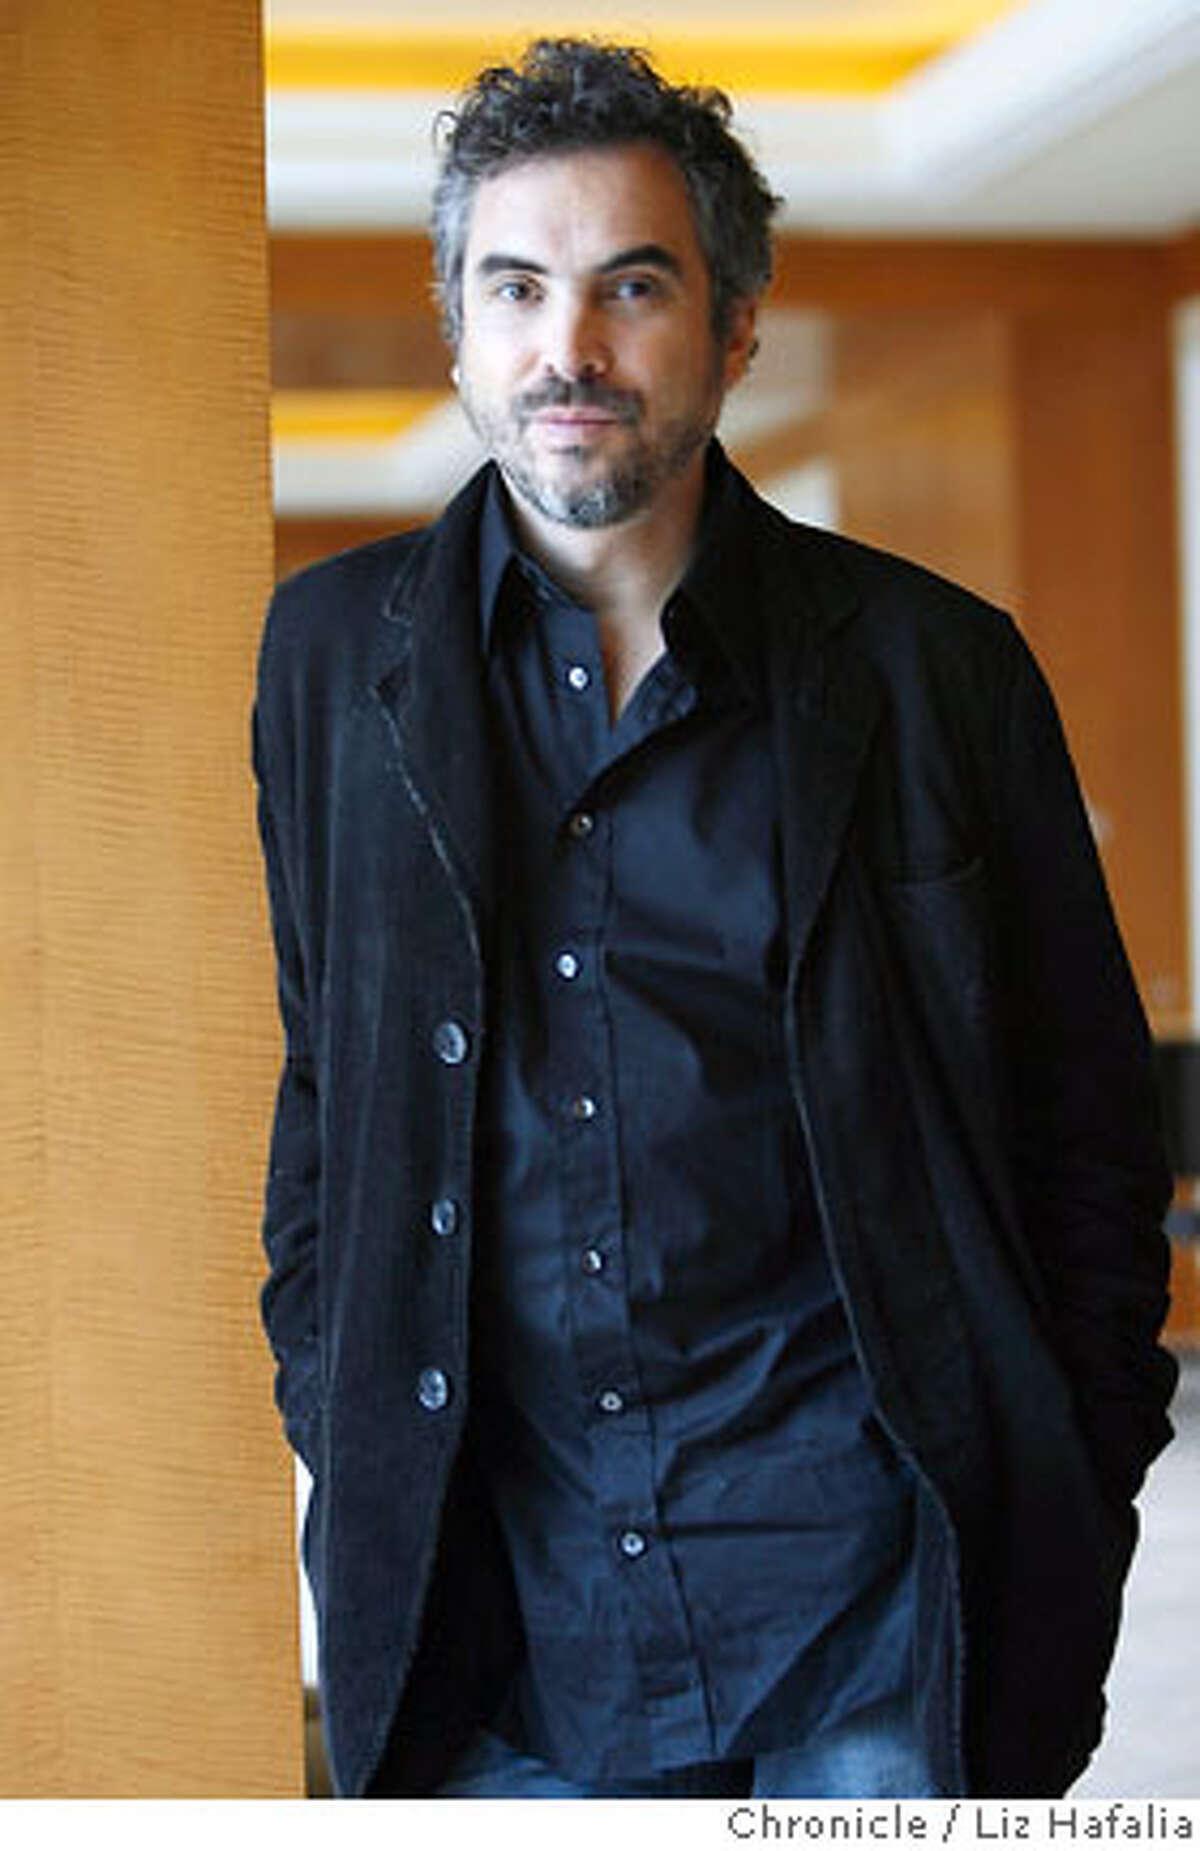 .JPG Alfonso Cuaron (